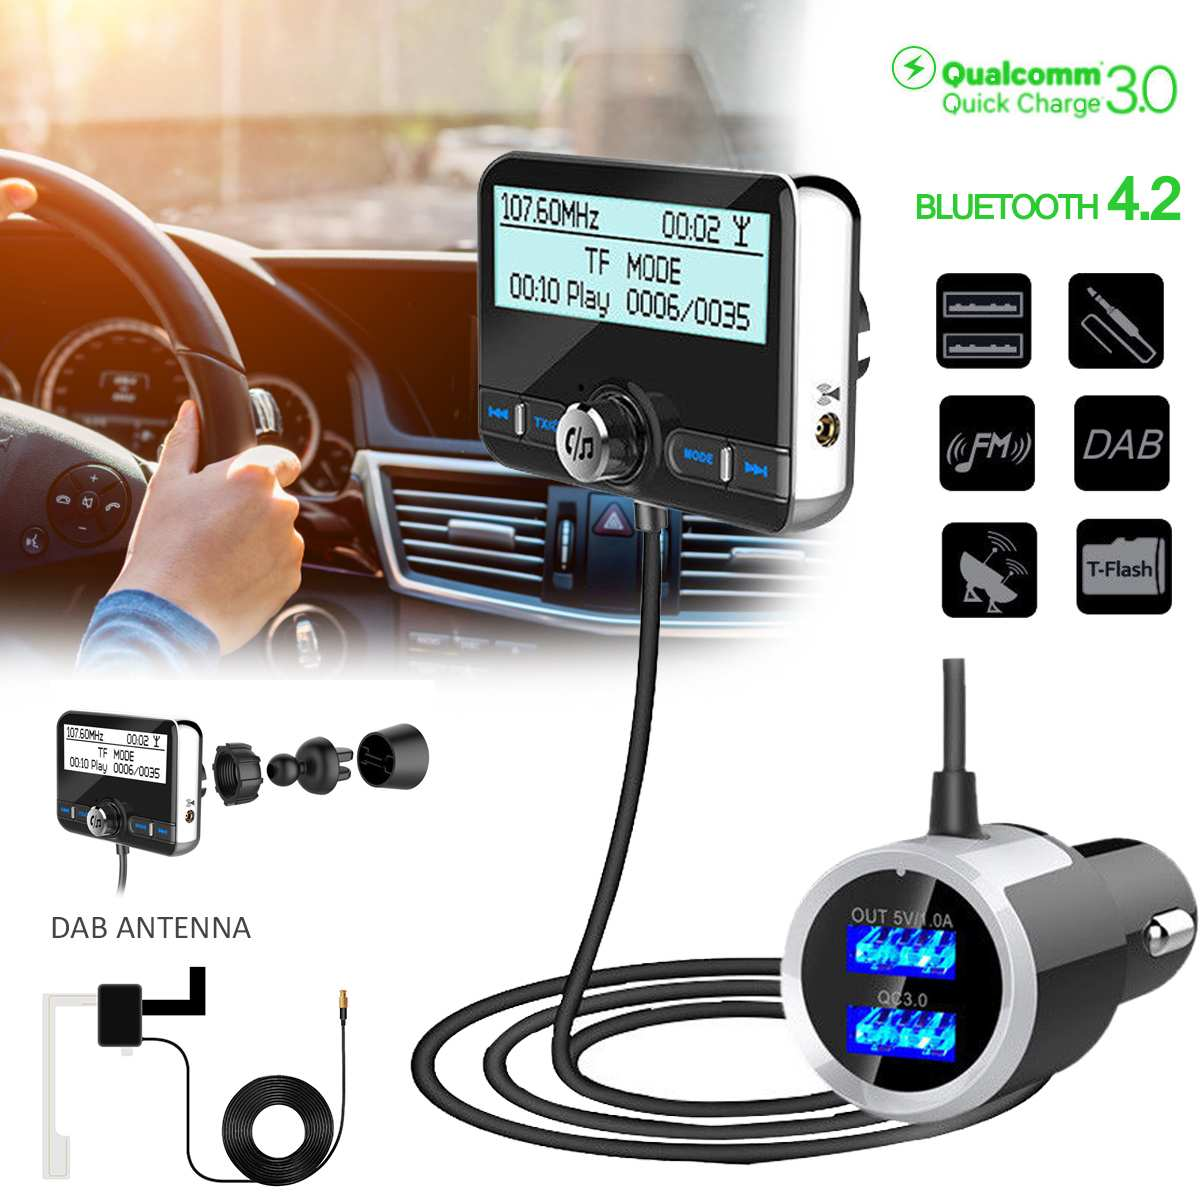 Tragbares Audio & Video Unterhaltungselektronik Sanft Auto Dab-radio Receiver Tuner Usb Adapter Bluetooth Auto Sender Tf/aux Antenne Lcd Display Digital Radio Freisprechen